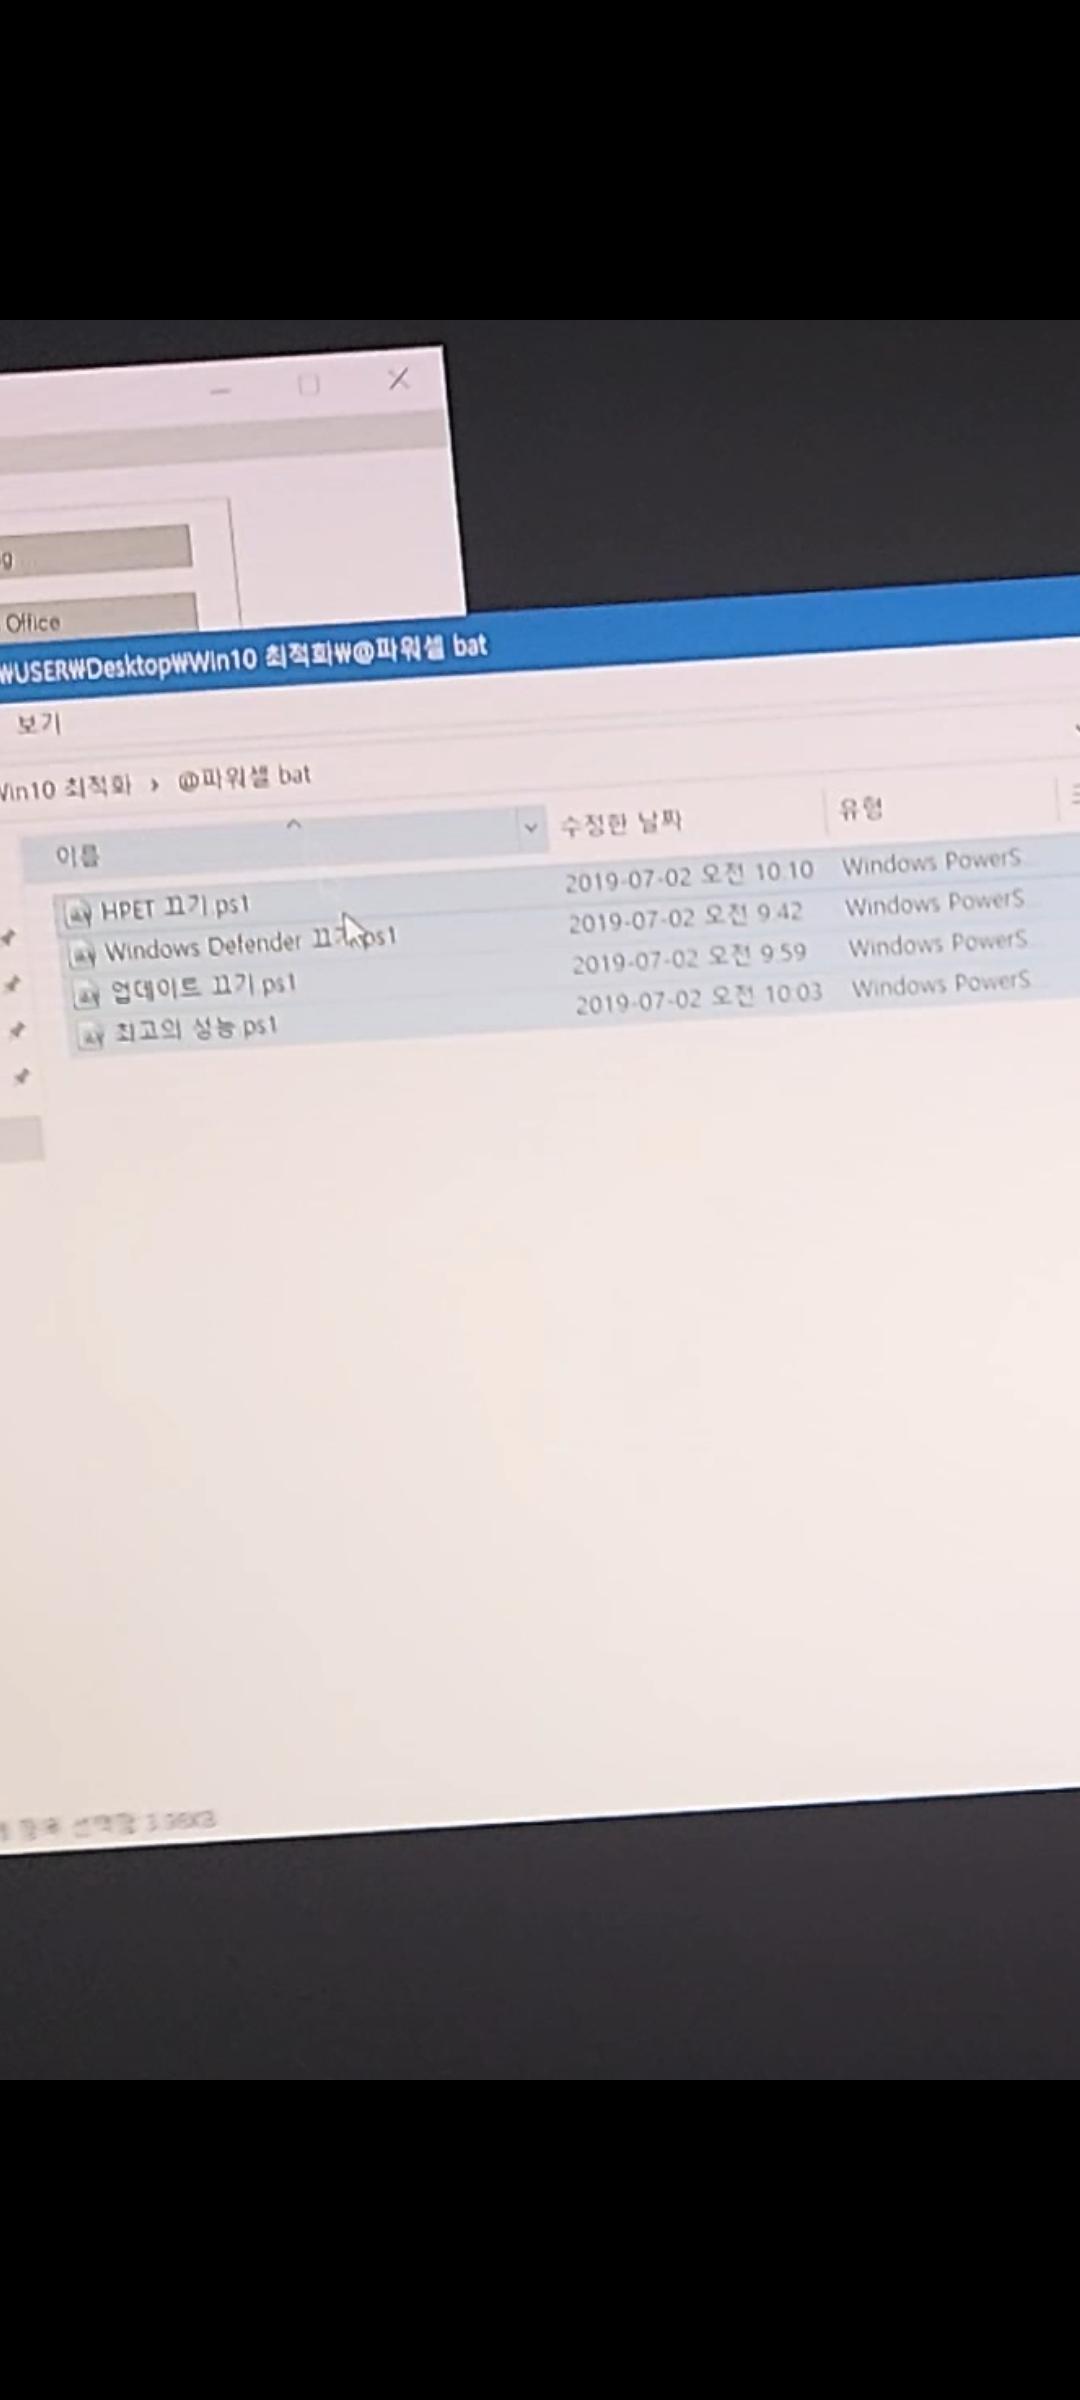 Screenshot_20210113-143219_Video Player.jpg